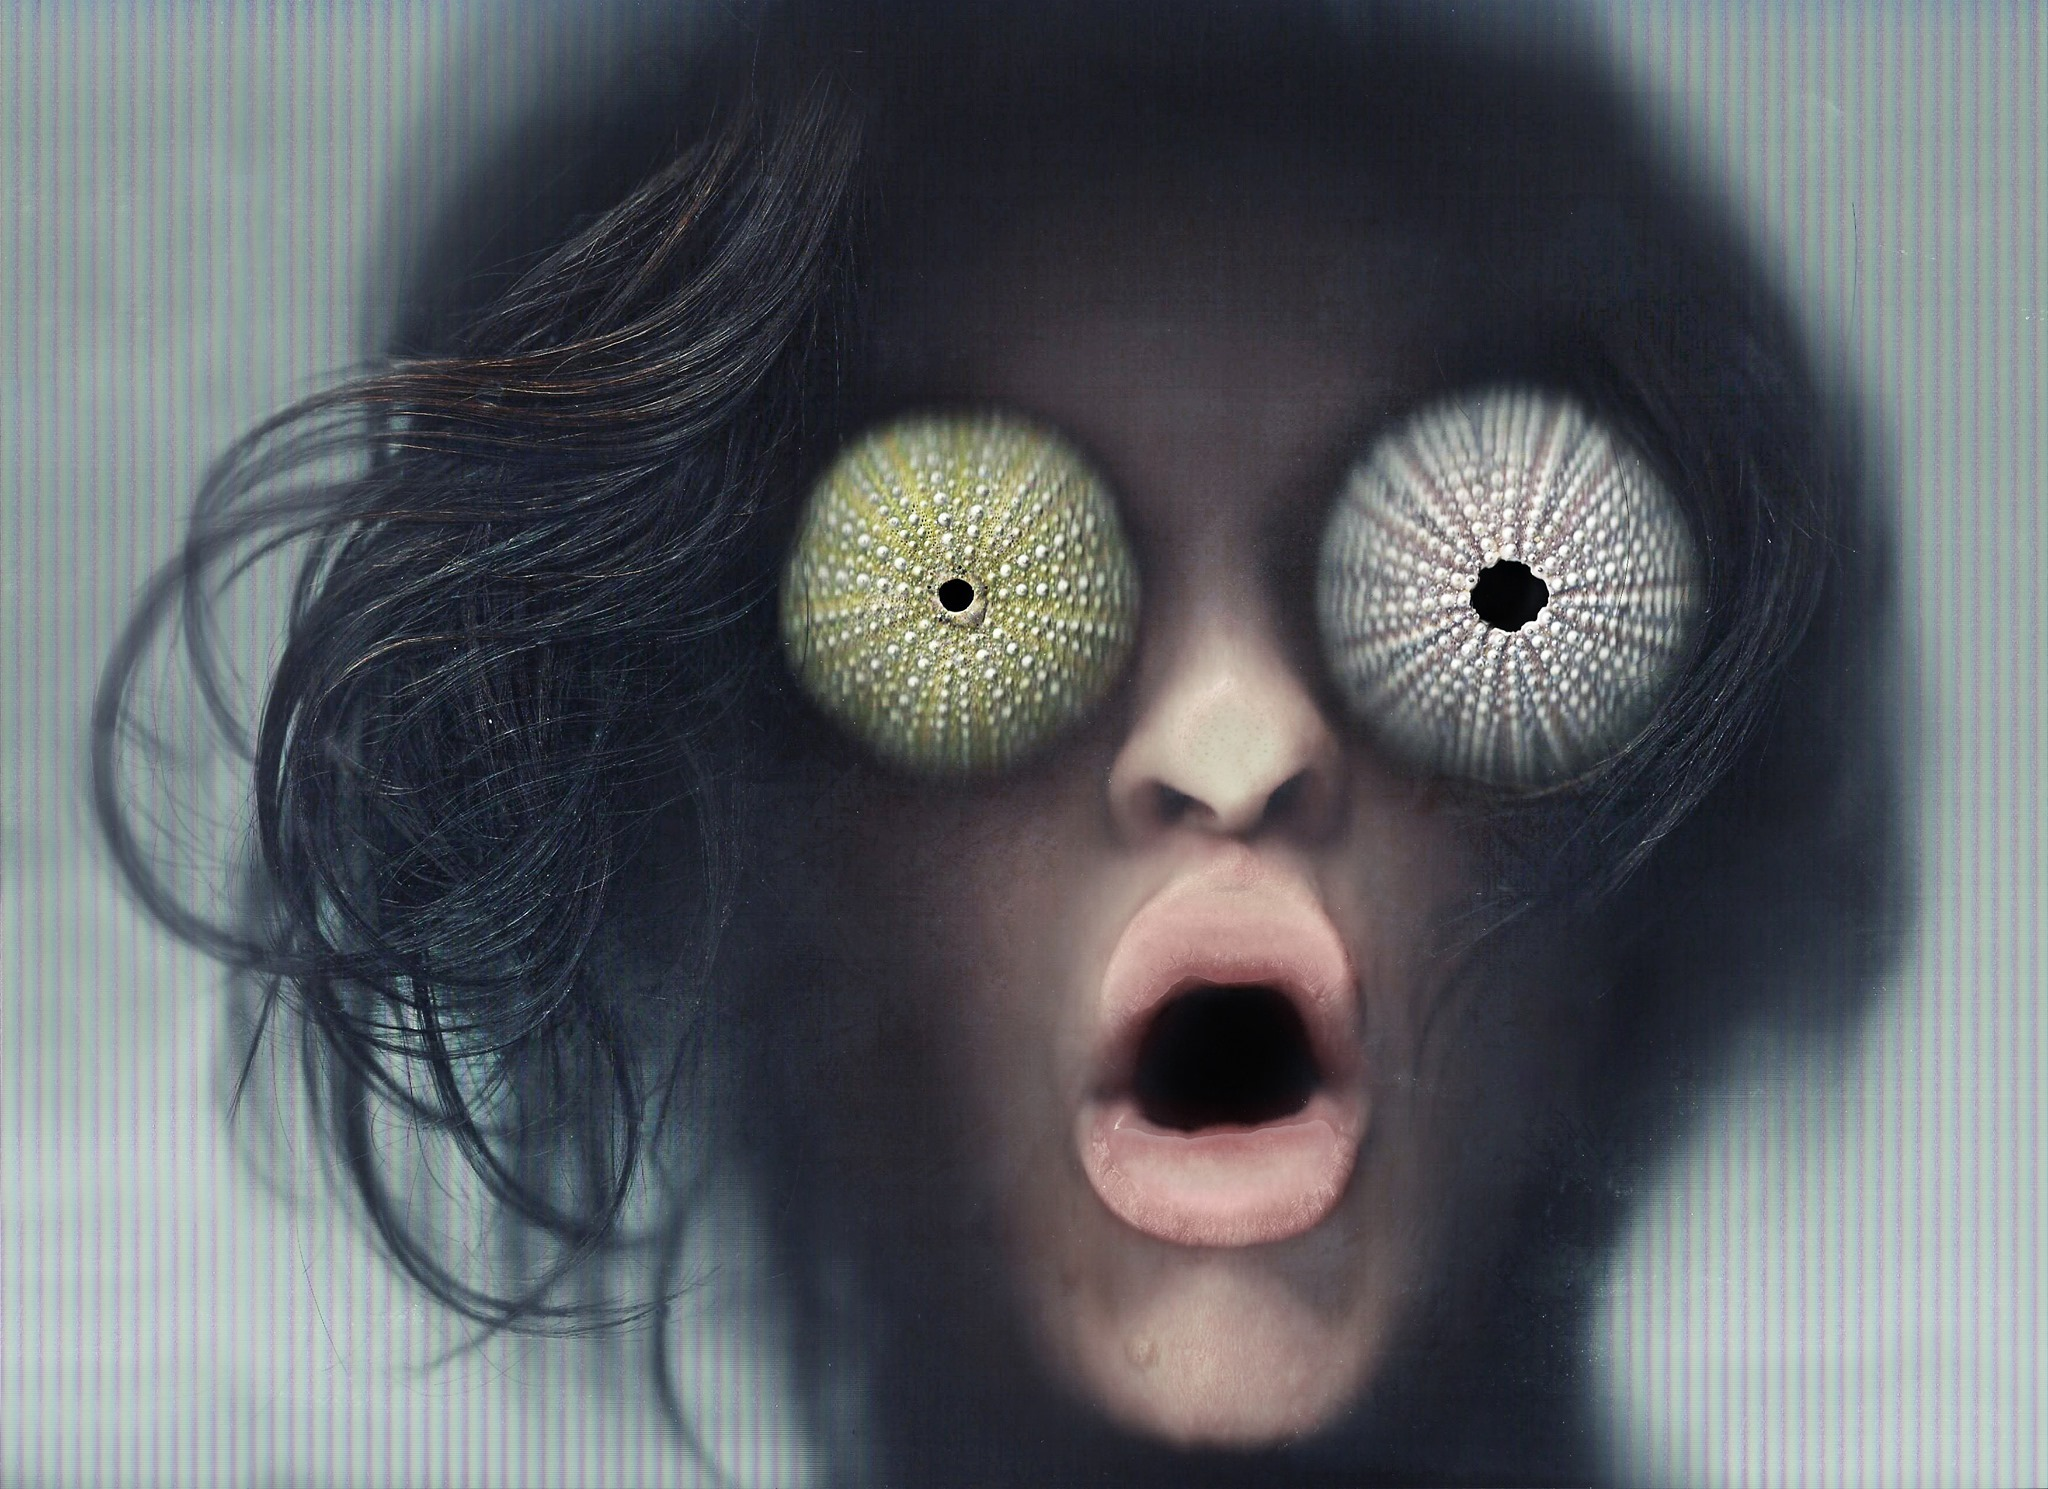 Medúza | Foto Michaela Petřek Linhartová